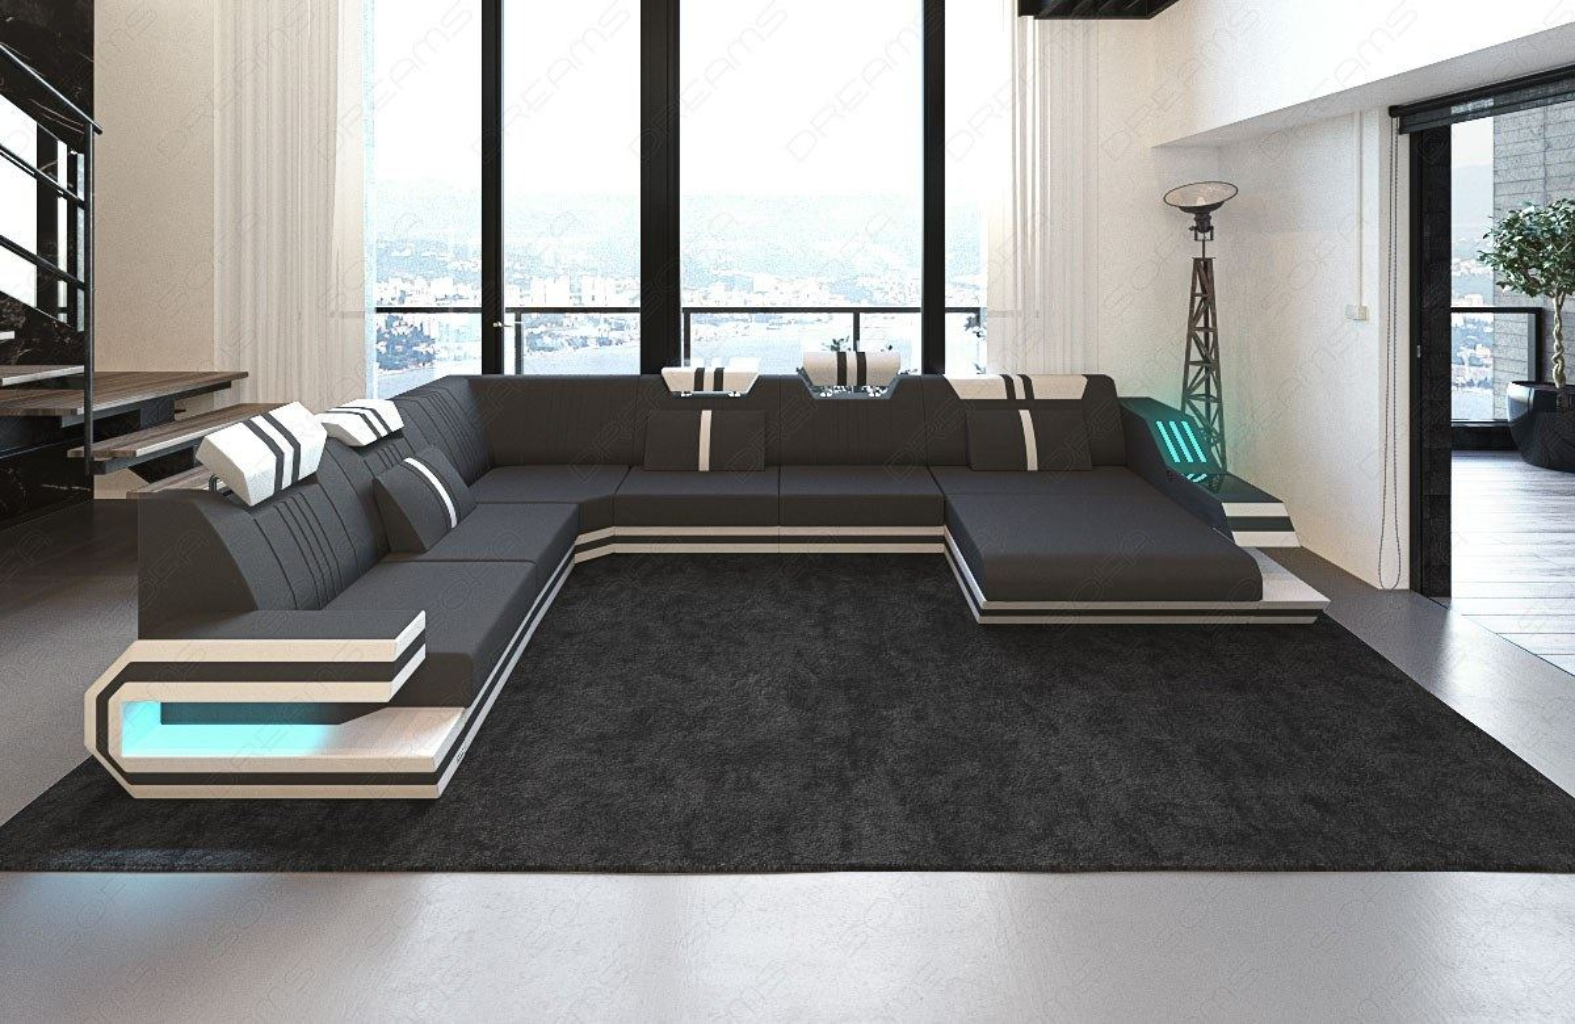 sofa ravenna xl grey designer couch leather with led lighting and usb ebay. Black Bedroom Furniture Sets. Home Design Ideas